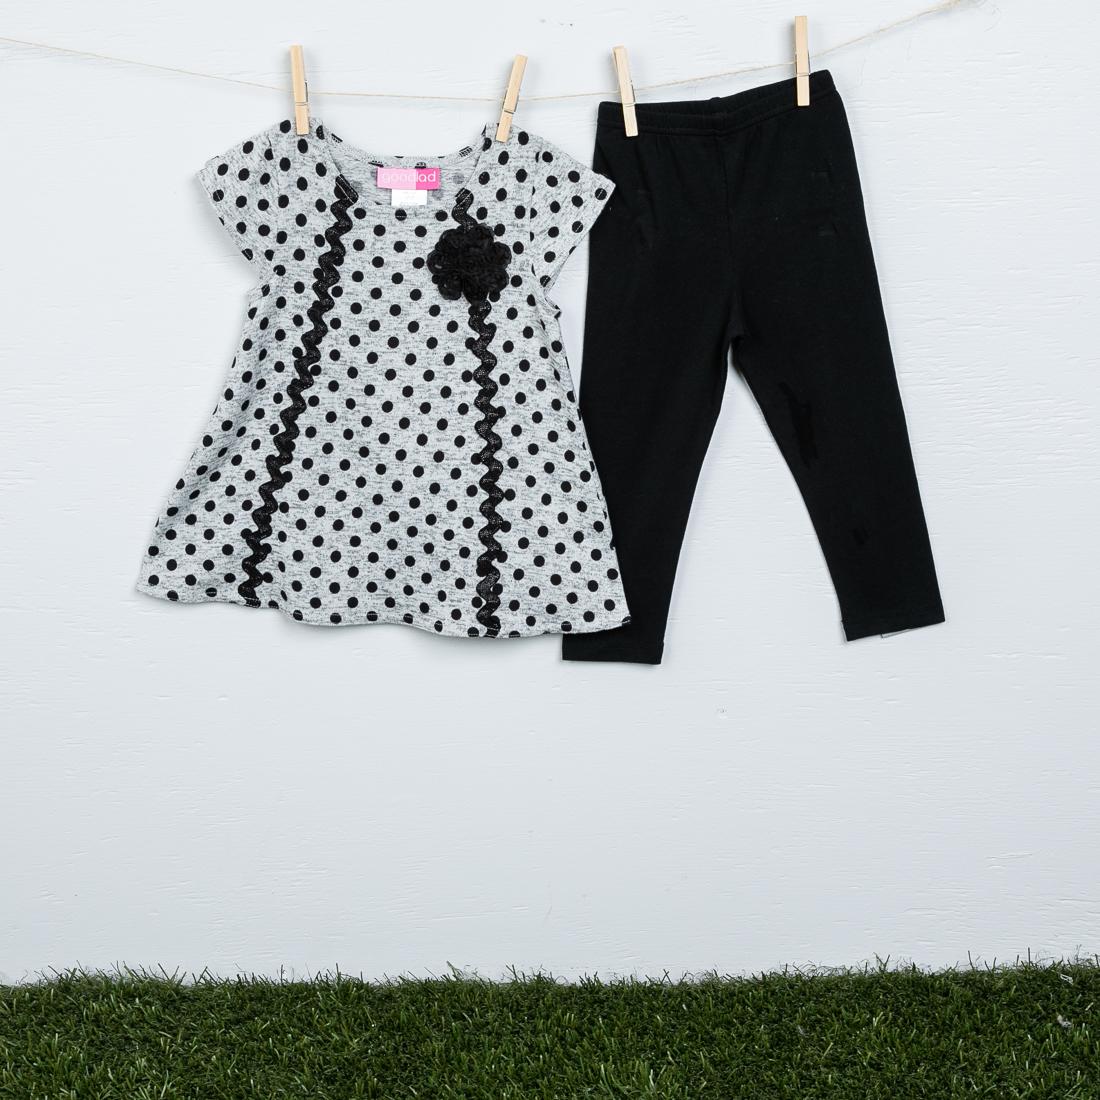 Black and Gray Polka Dot Legging Set & Kids Infants Toddlers | Clothing Accessories - Cracker Barrel Old ...